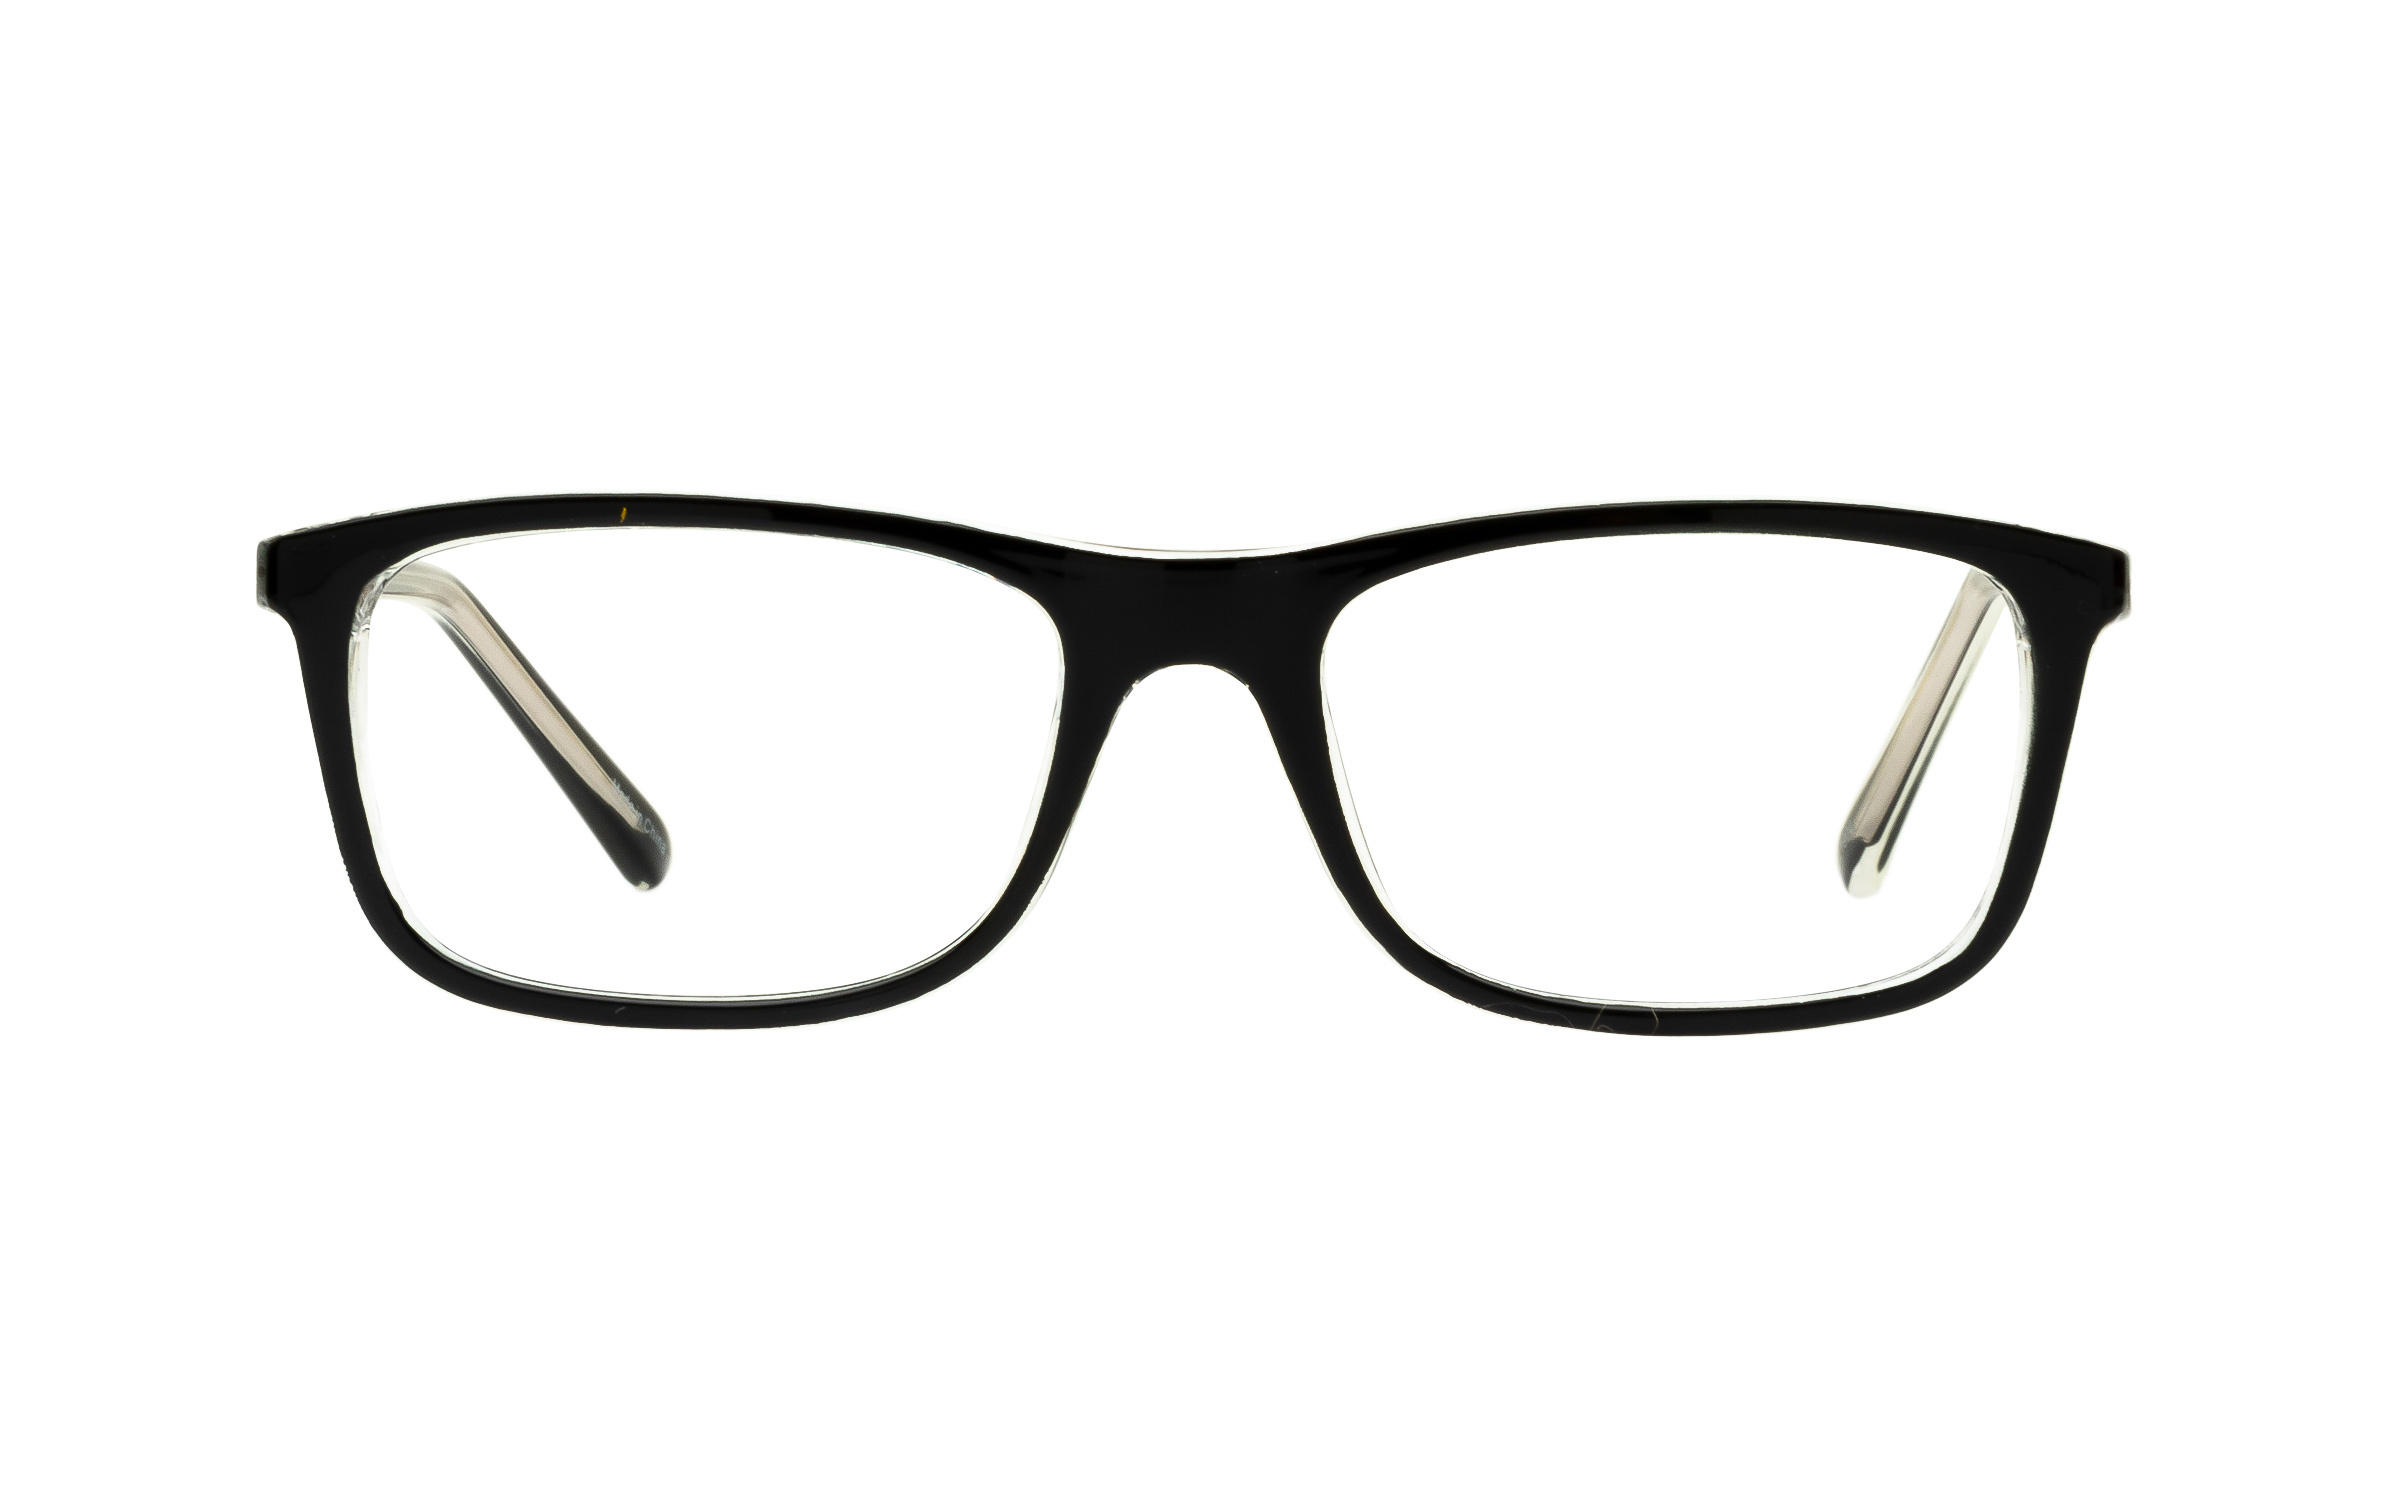 ClearlyBasics Clearly Junior Azalea KID011 C03 (49) Eyeglasses and Frame in Black | Plastic - Online Coastal